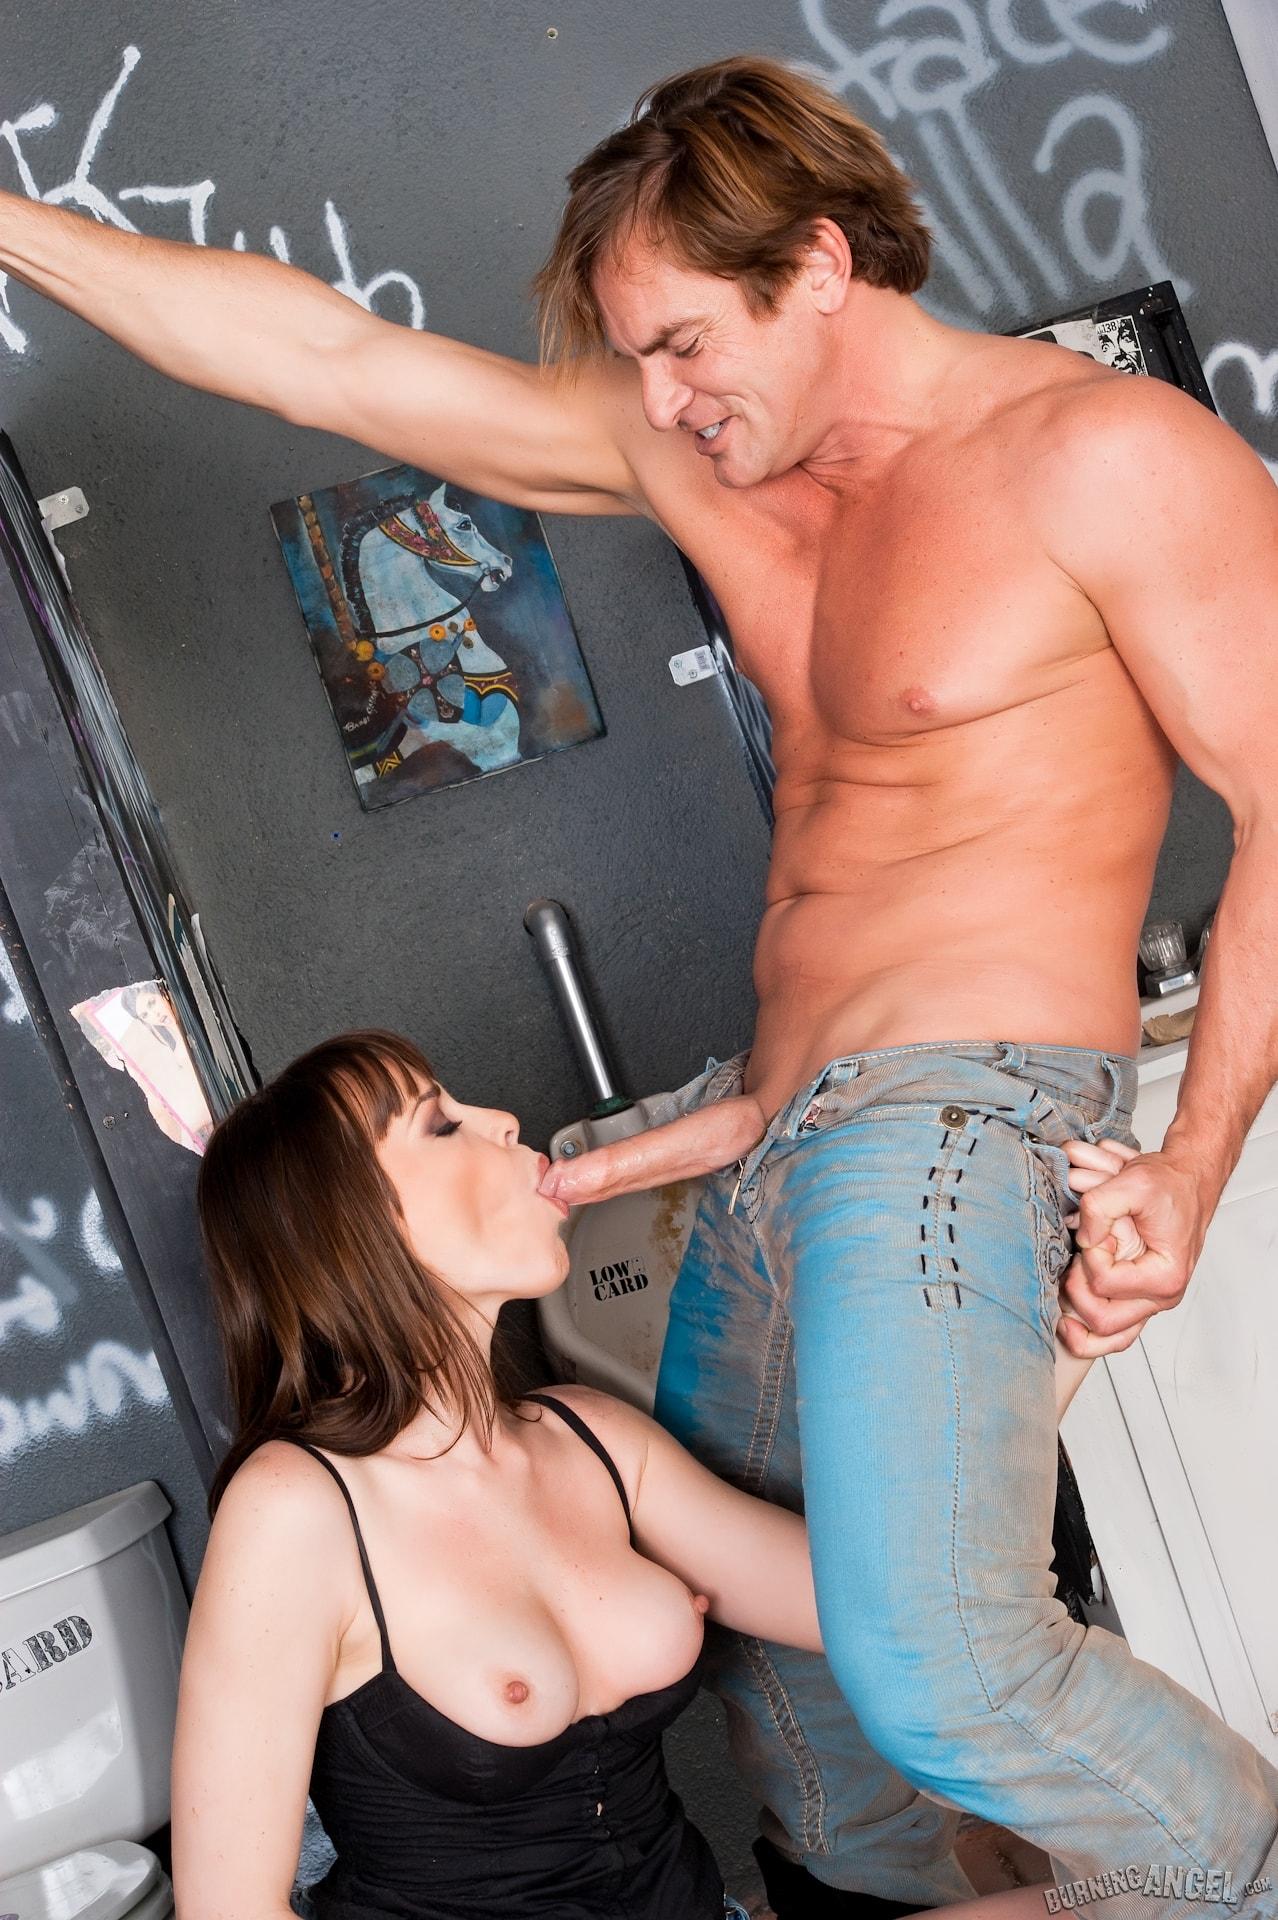 Burning Angel 'Dana is Crazy For Evan' starring Dana DeArmond (Photo 5)